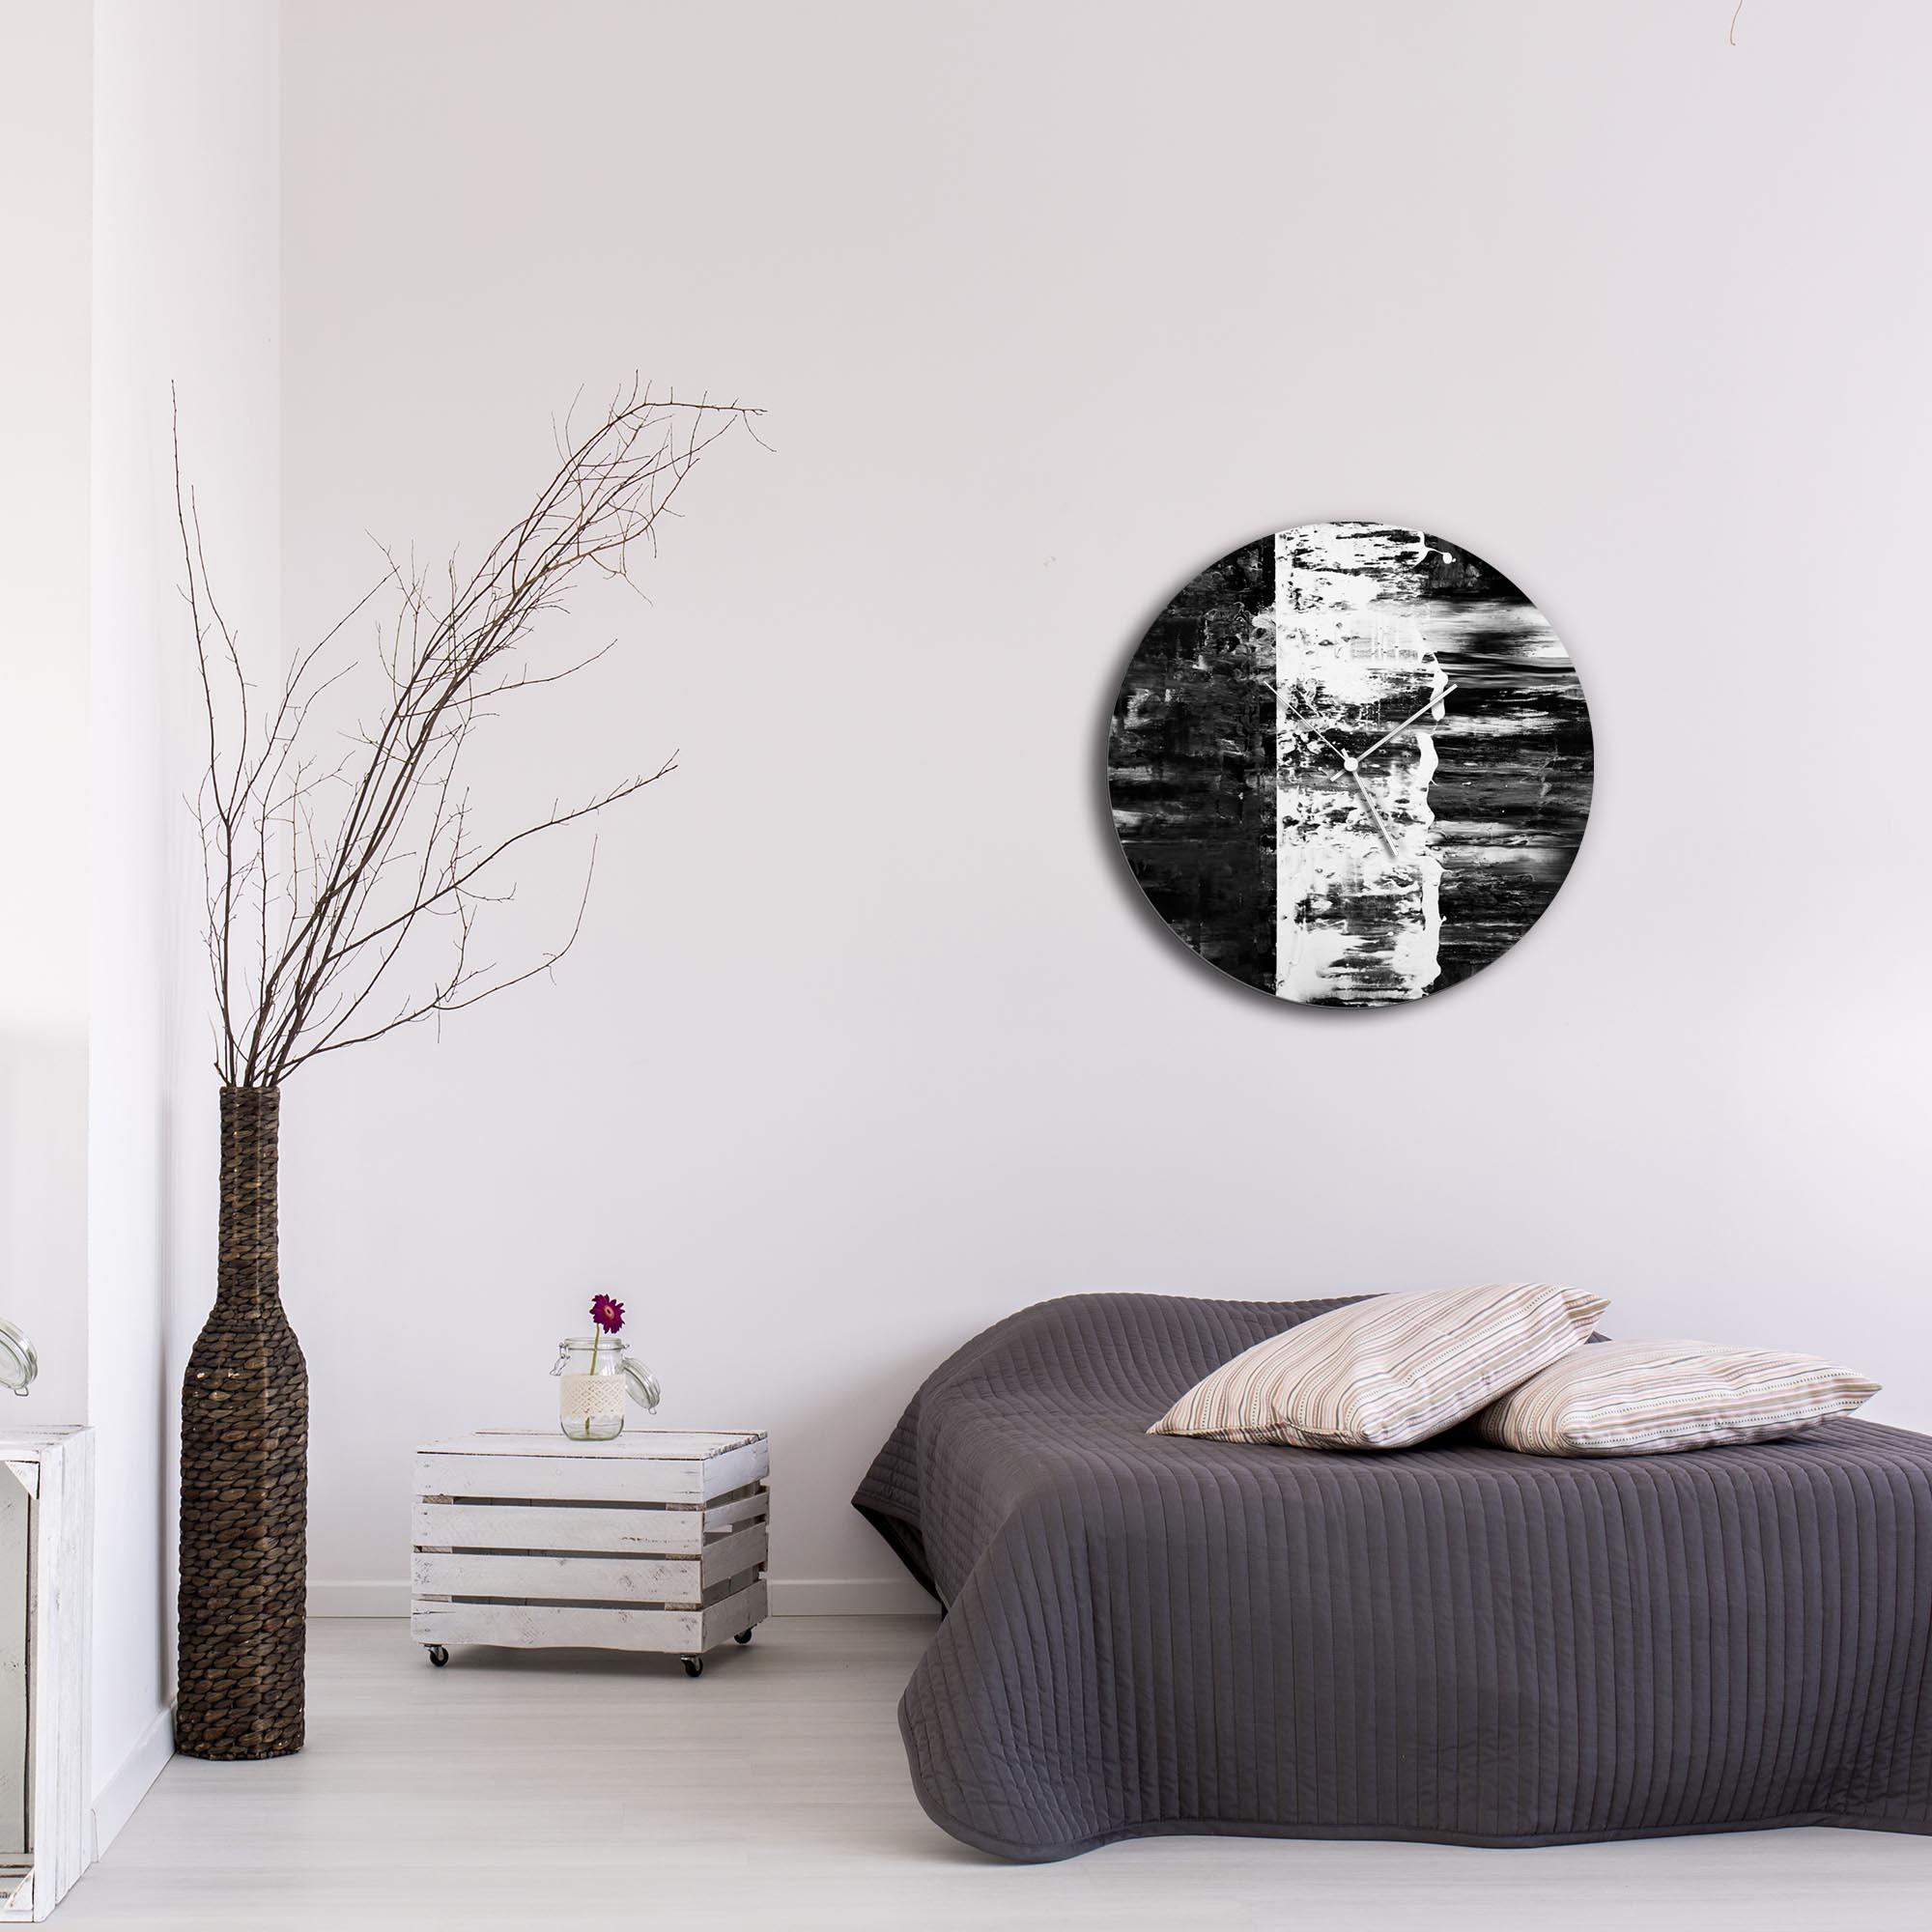 Black Street Circle Clock Large by Mendo Vasilevski - Urban Abstract Home Decor - Lifestyle View